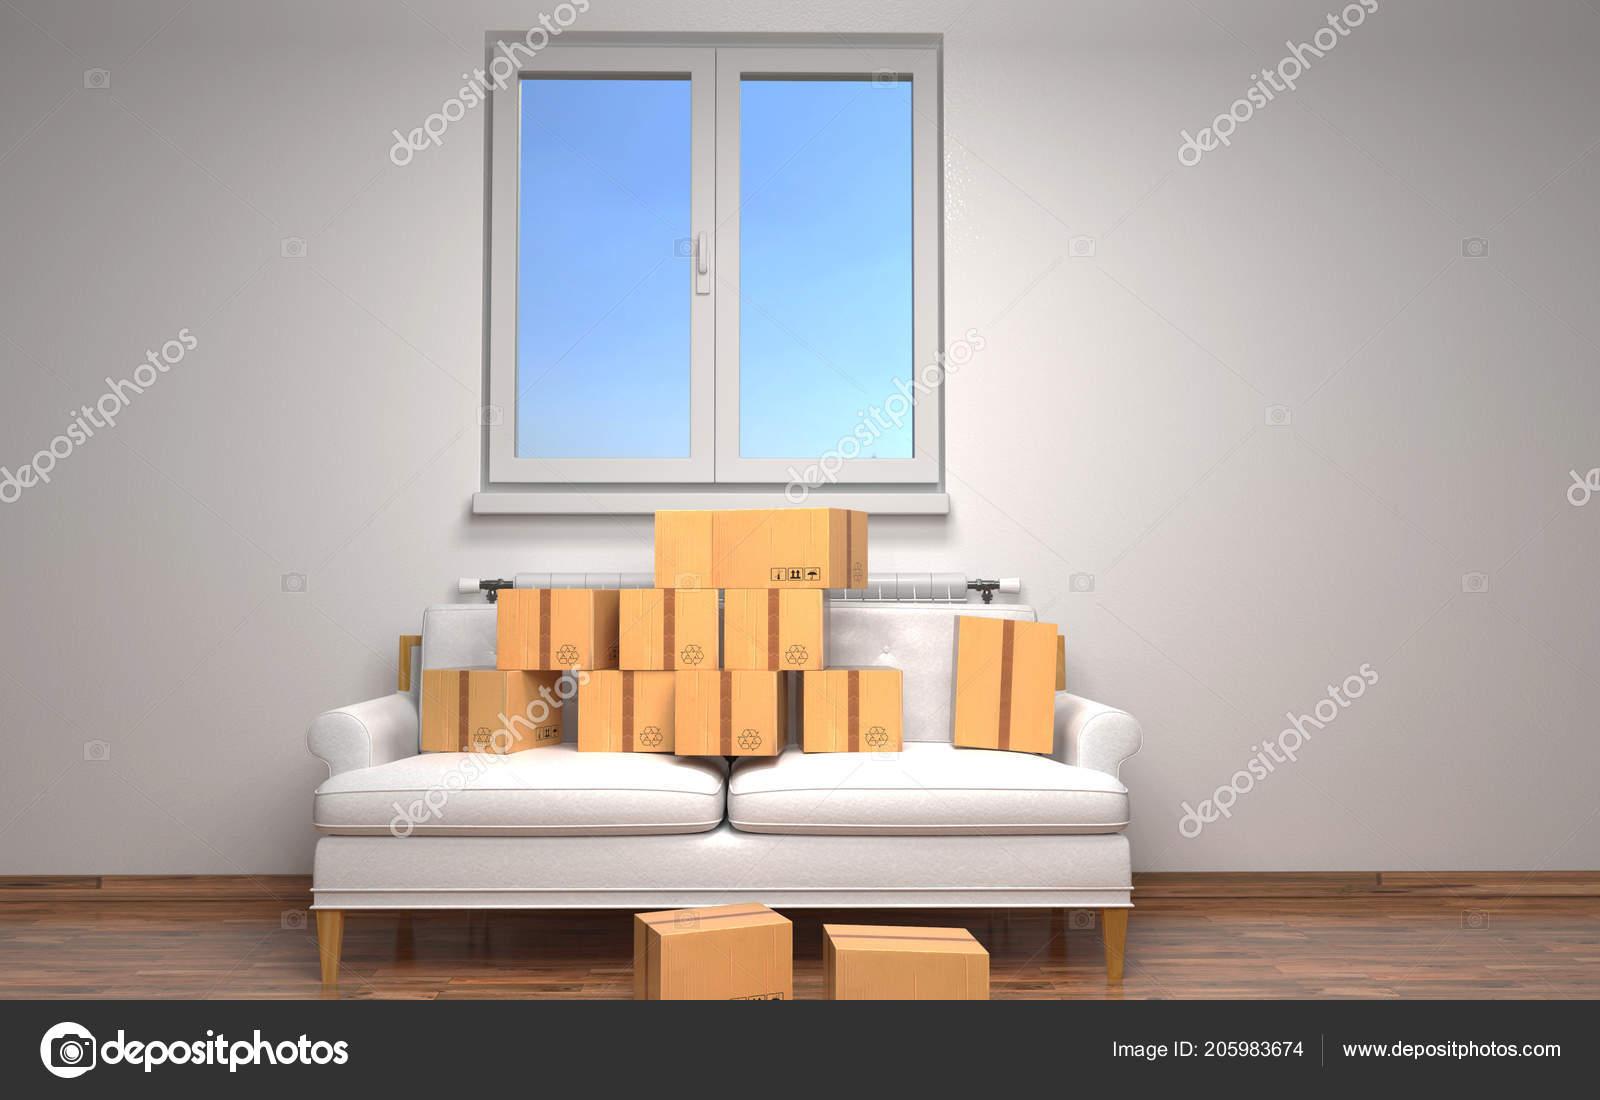 Boxes in room.3D rendering.